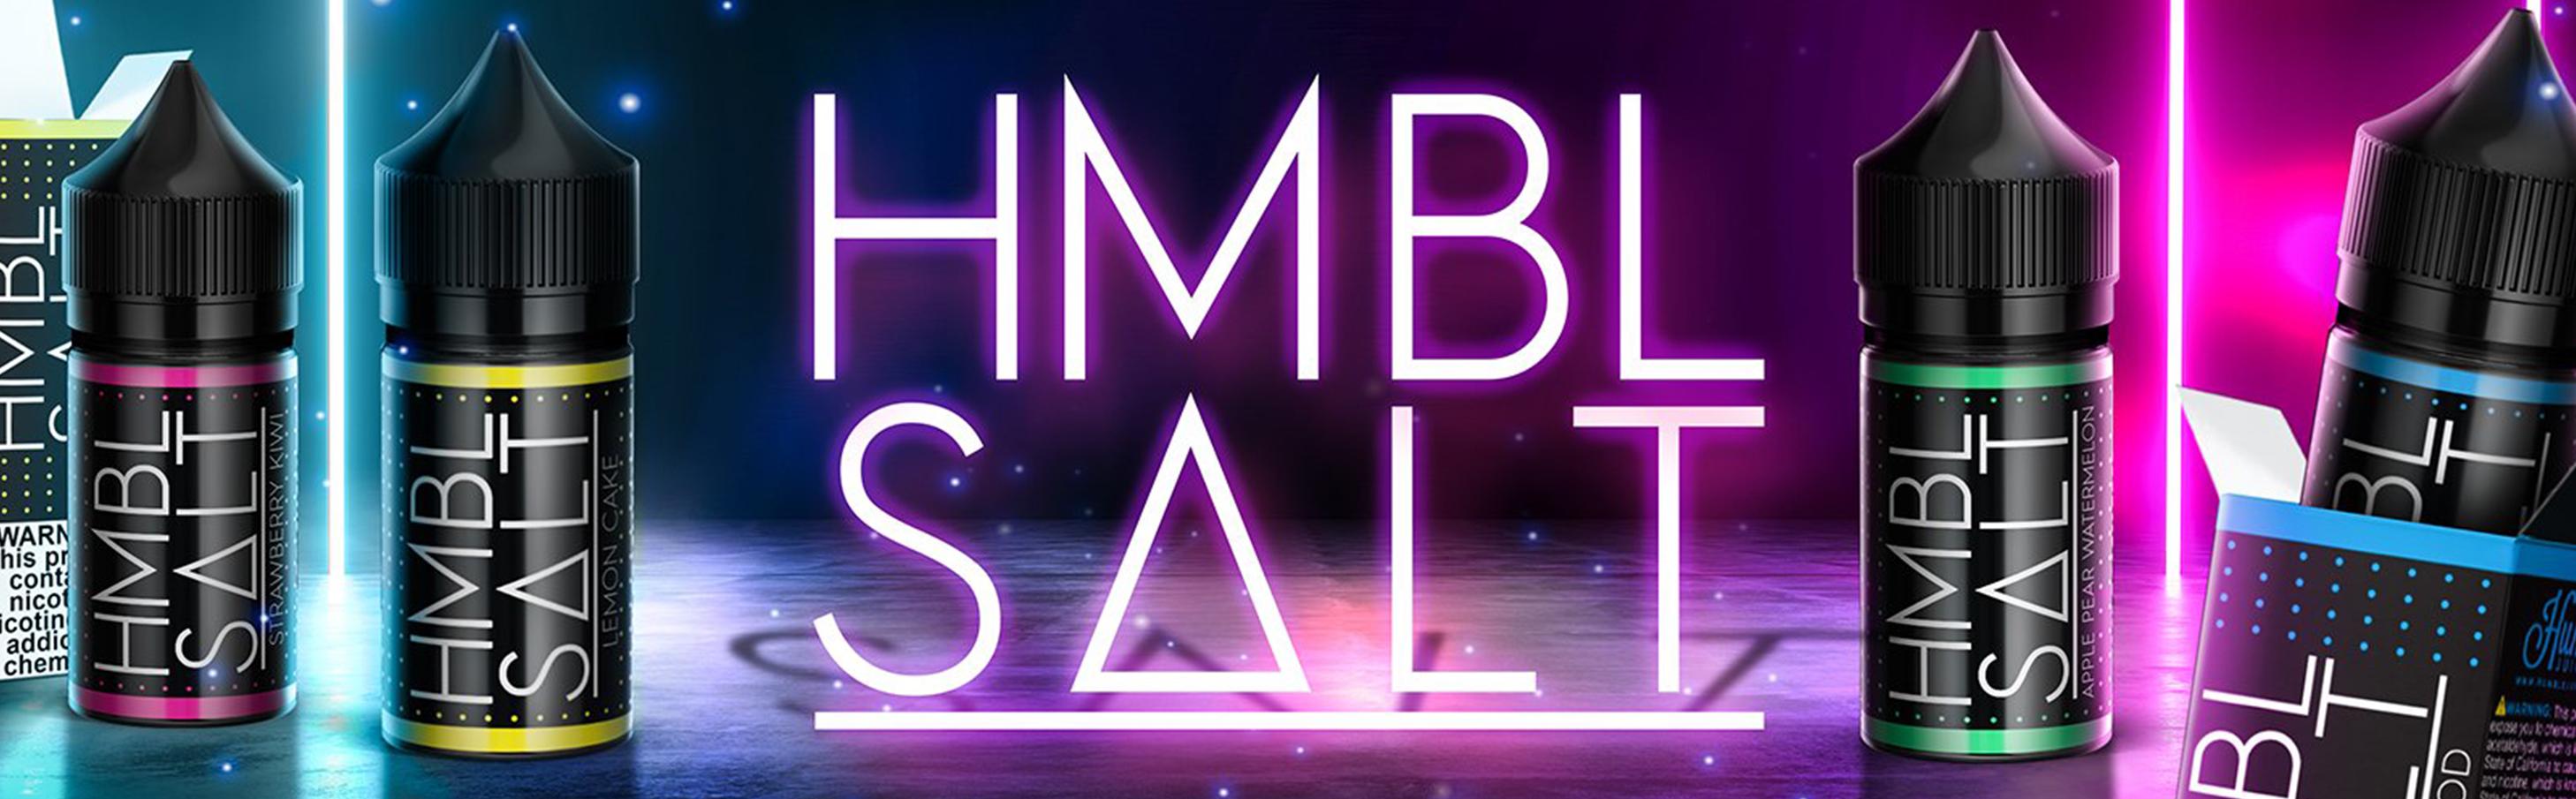 hmbl-salt-nic-juice-banner-wholesale.jpeg